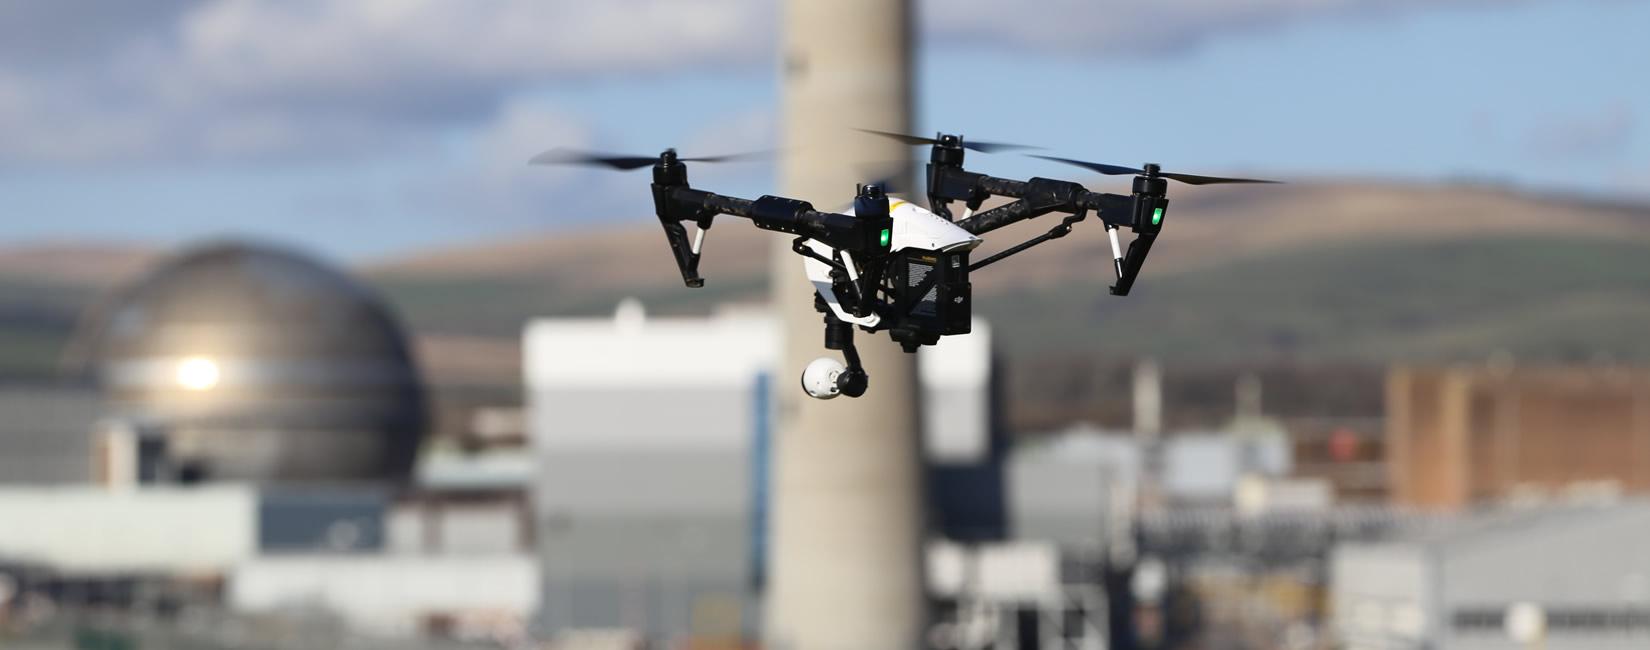 aerialfilming4